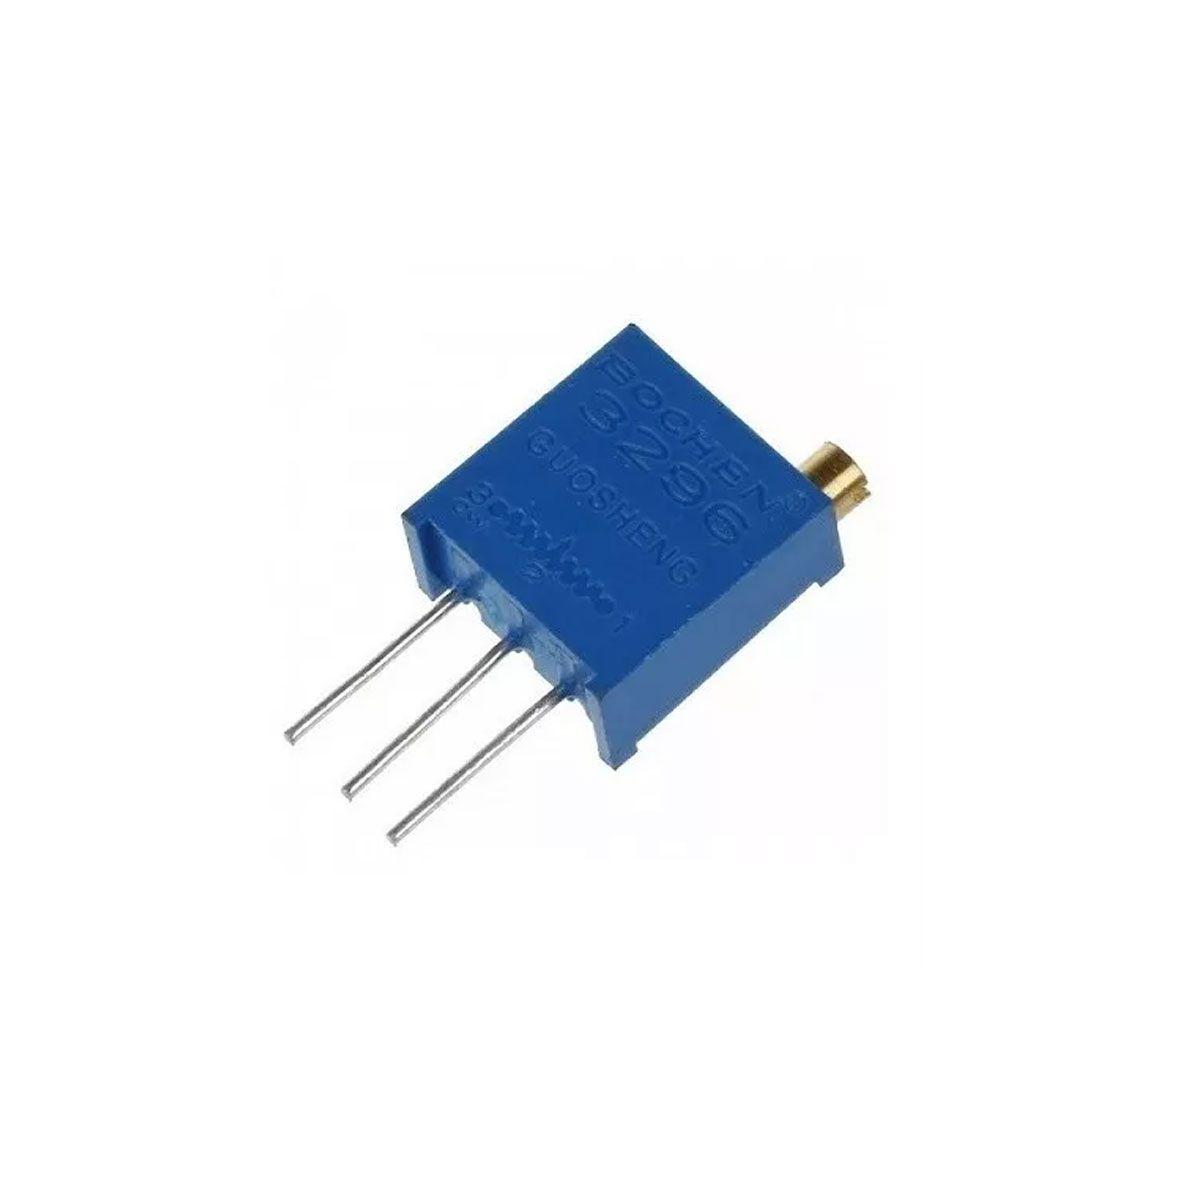 Trimpot / Potenciômetro 10K Multivoltas 3296  - Vertical